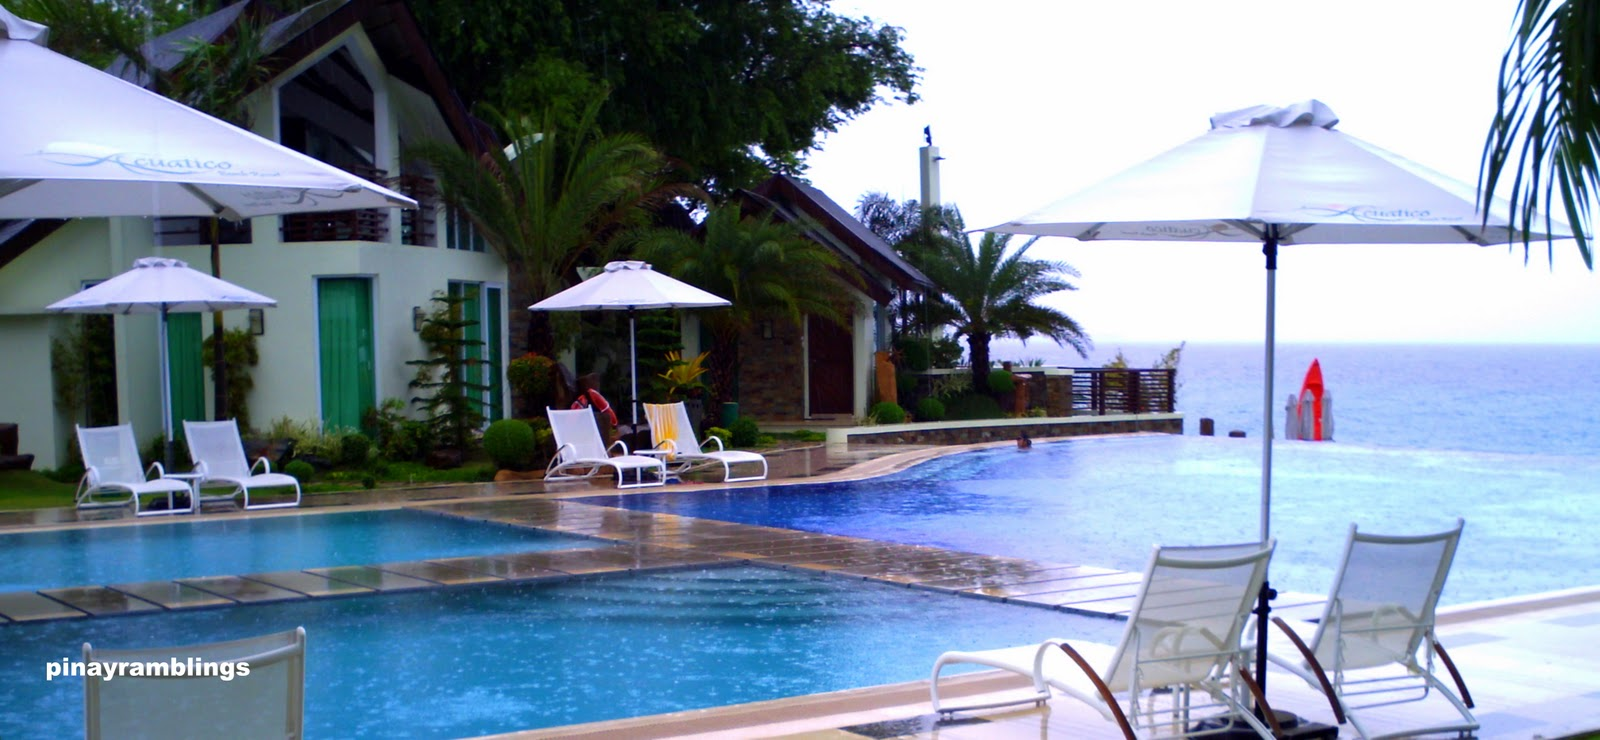 Acuatico Beach Resort Batangas Philippines Pinay Daily Ramblings